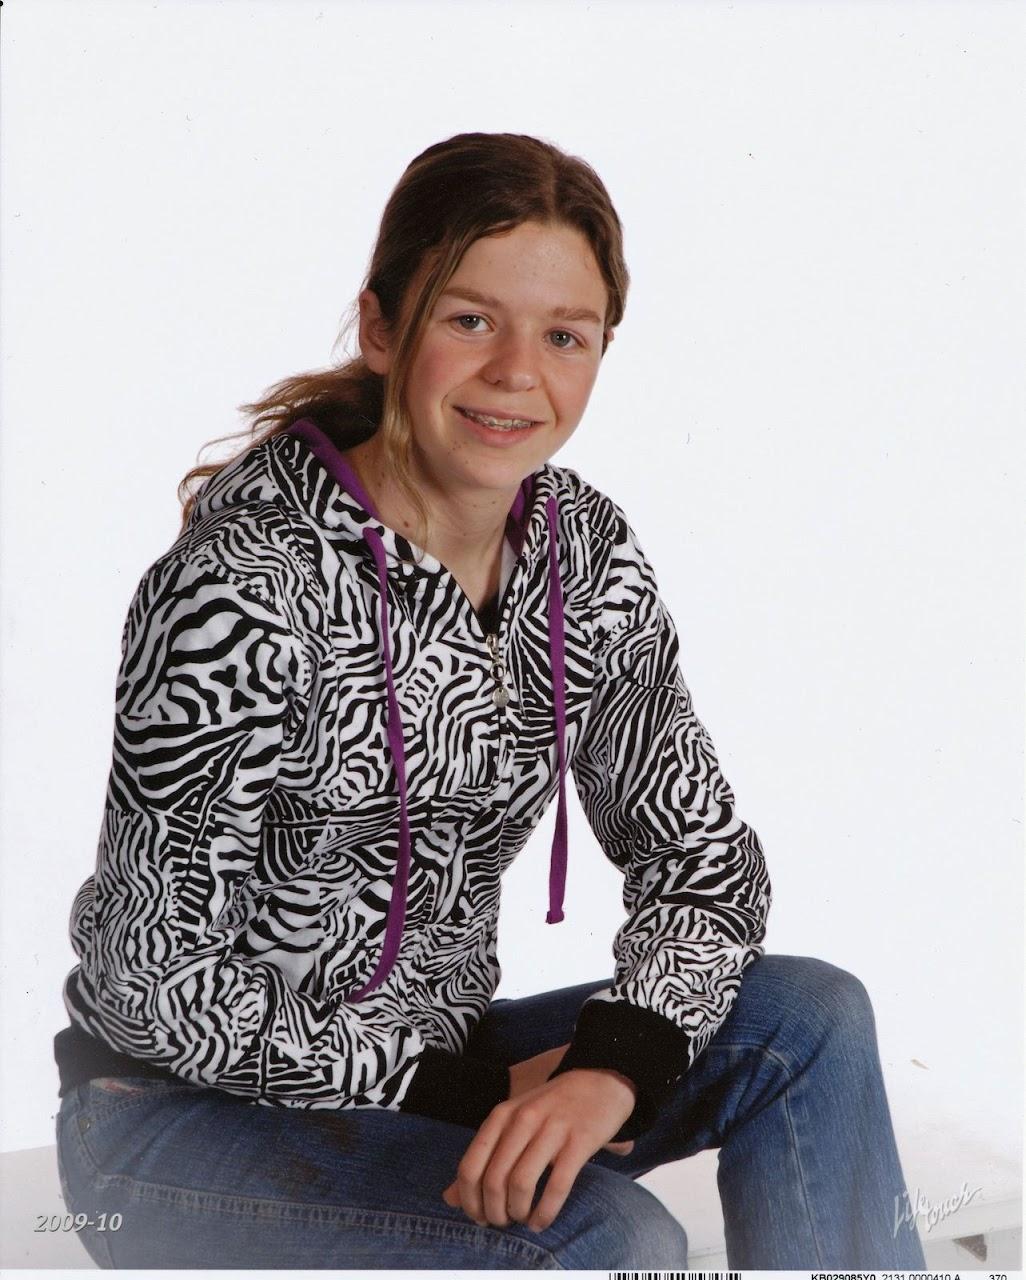 Courtney 8th grade 2010